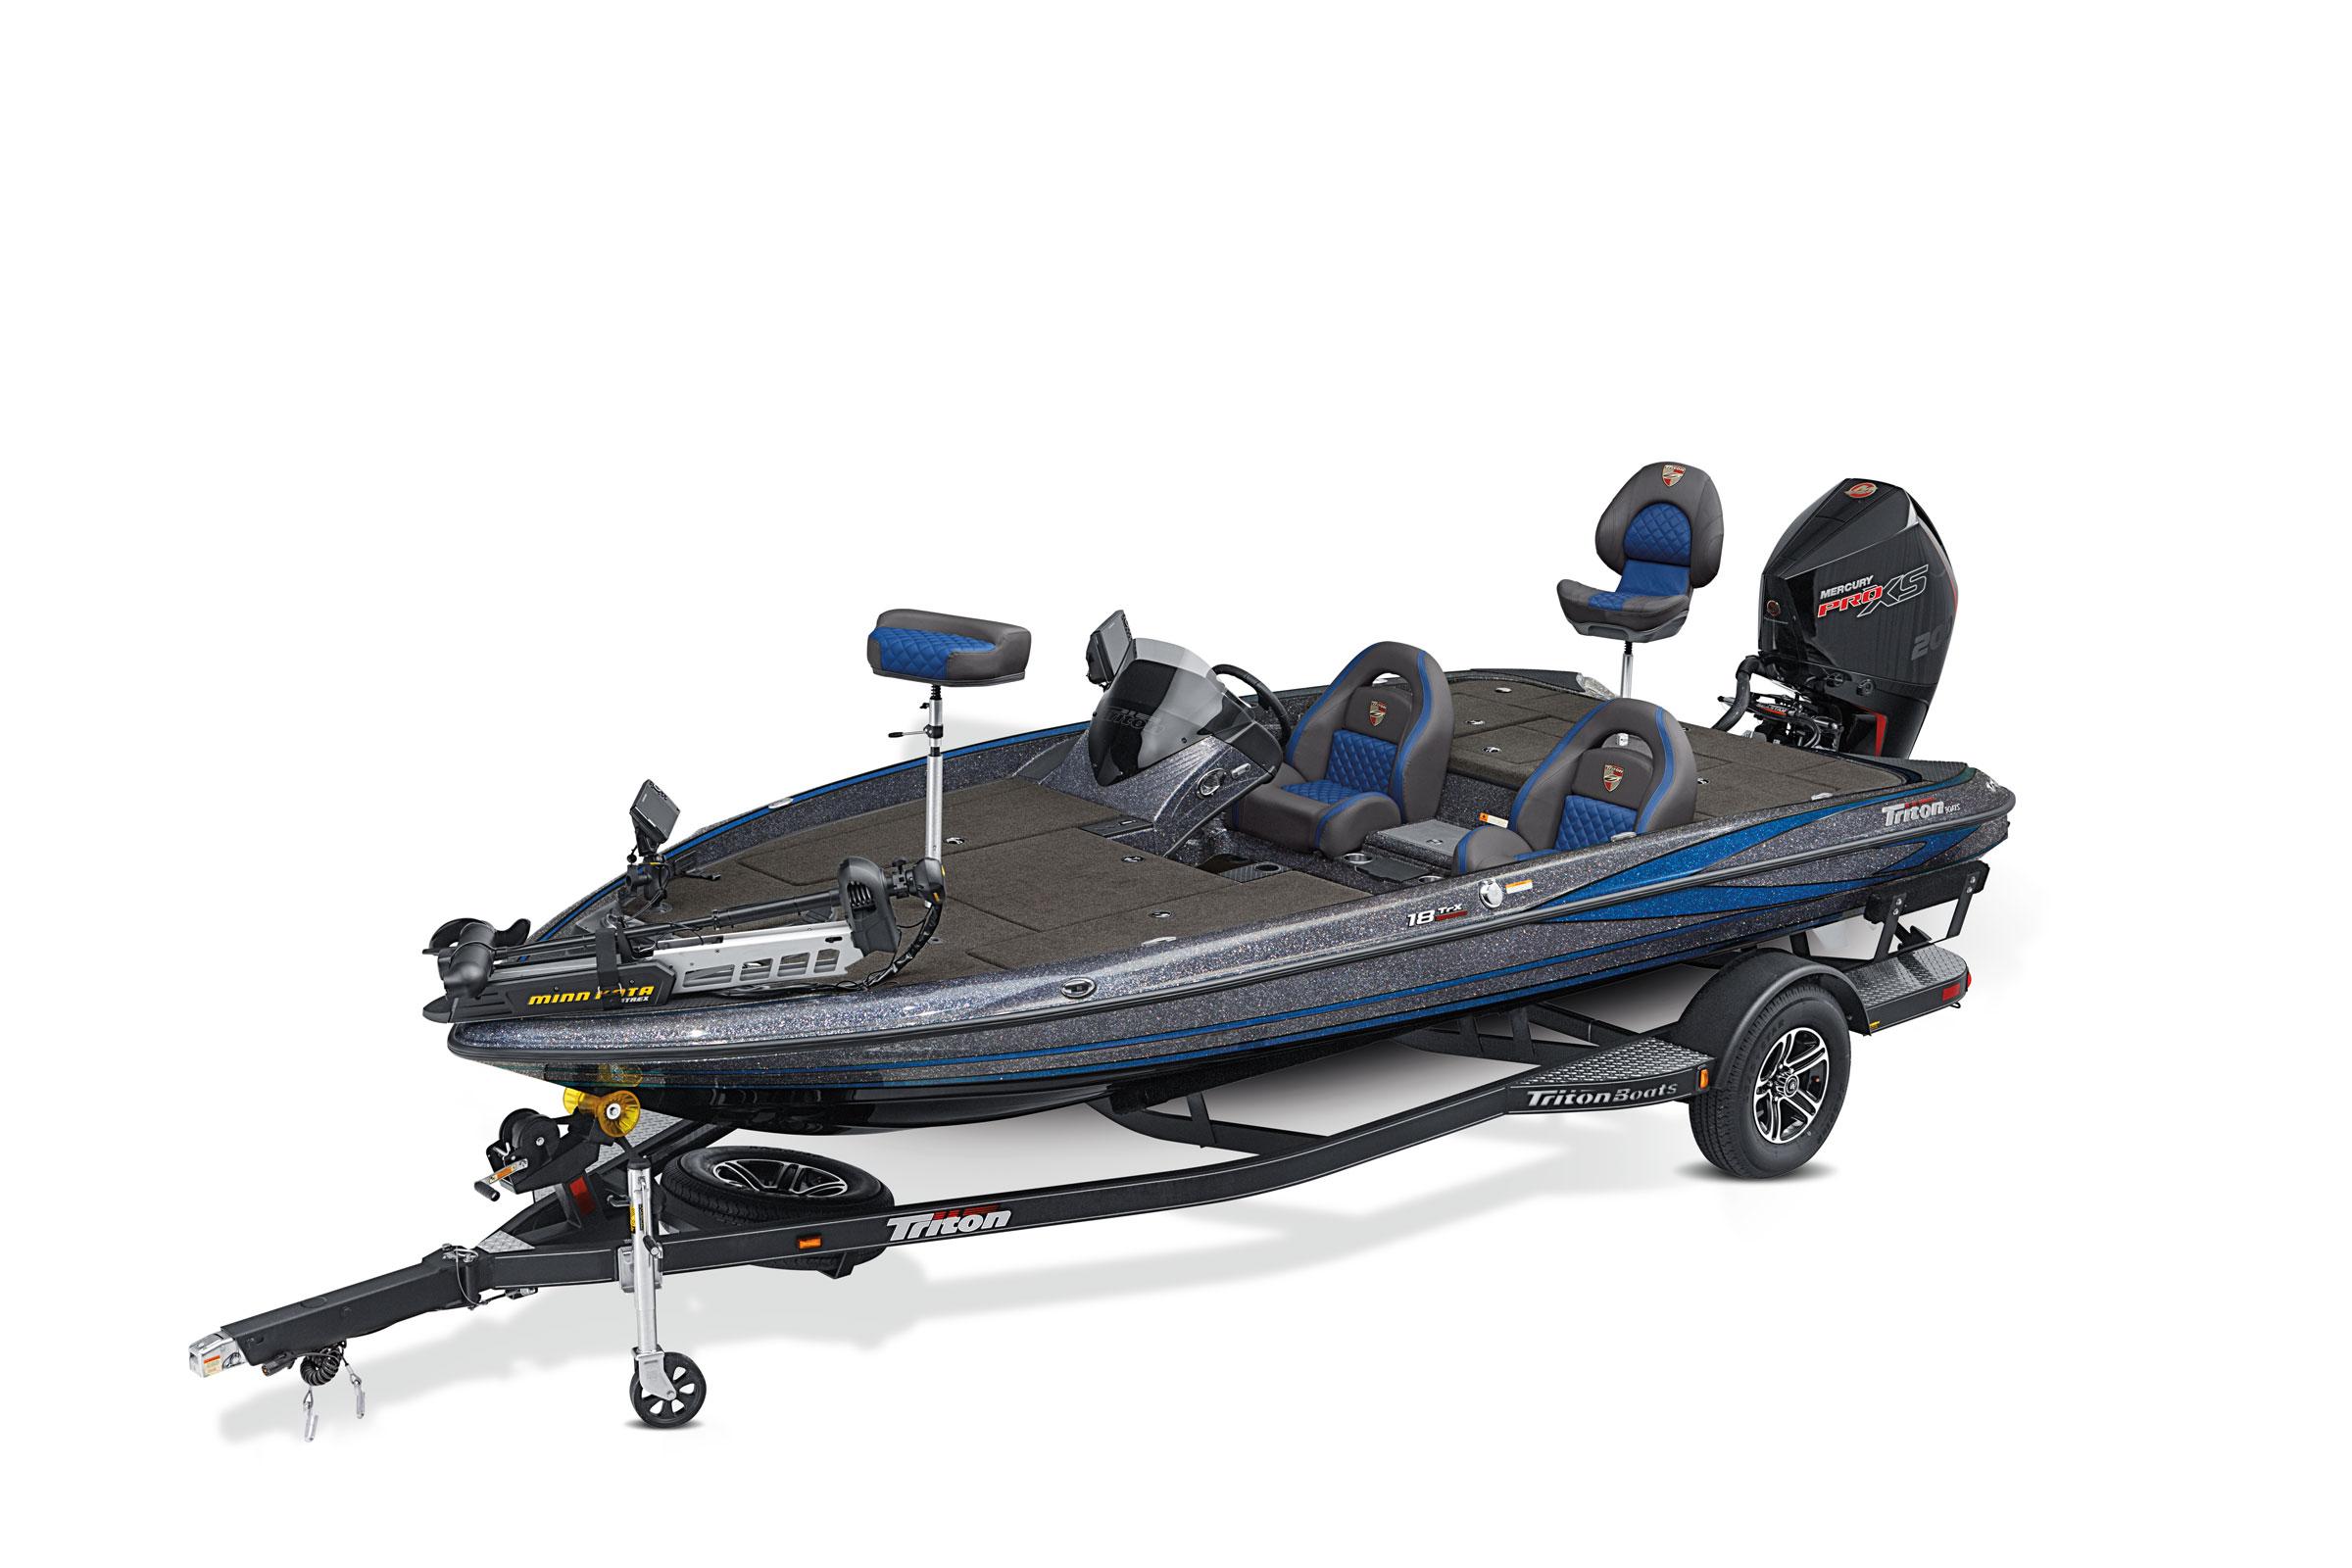 2019 18 Trx Bass Boat Triton Boats